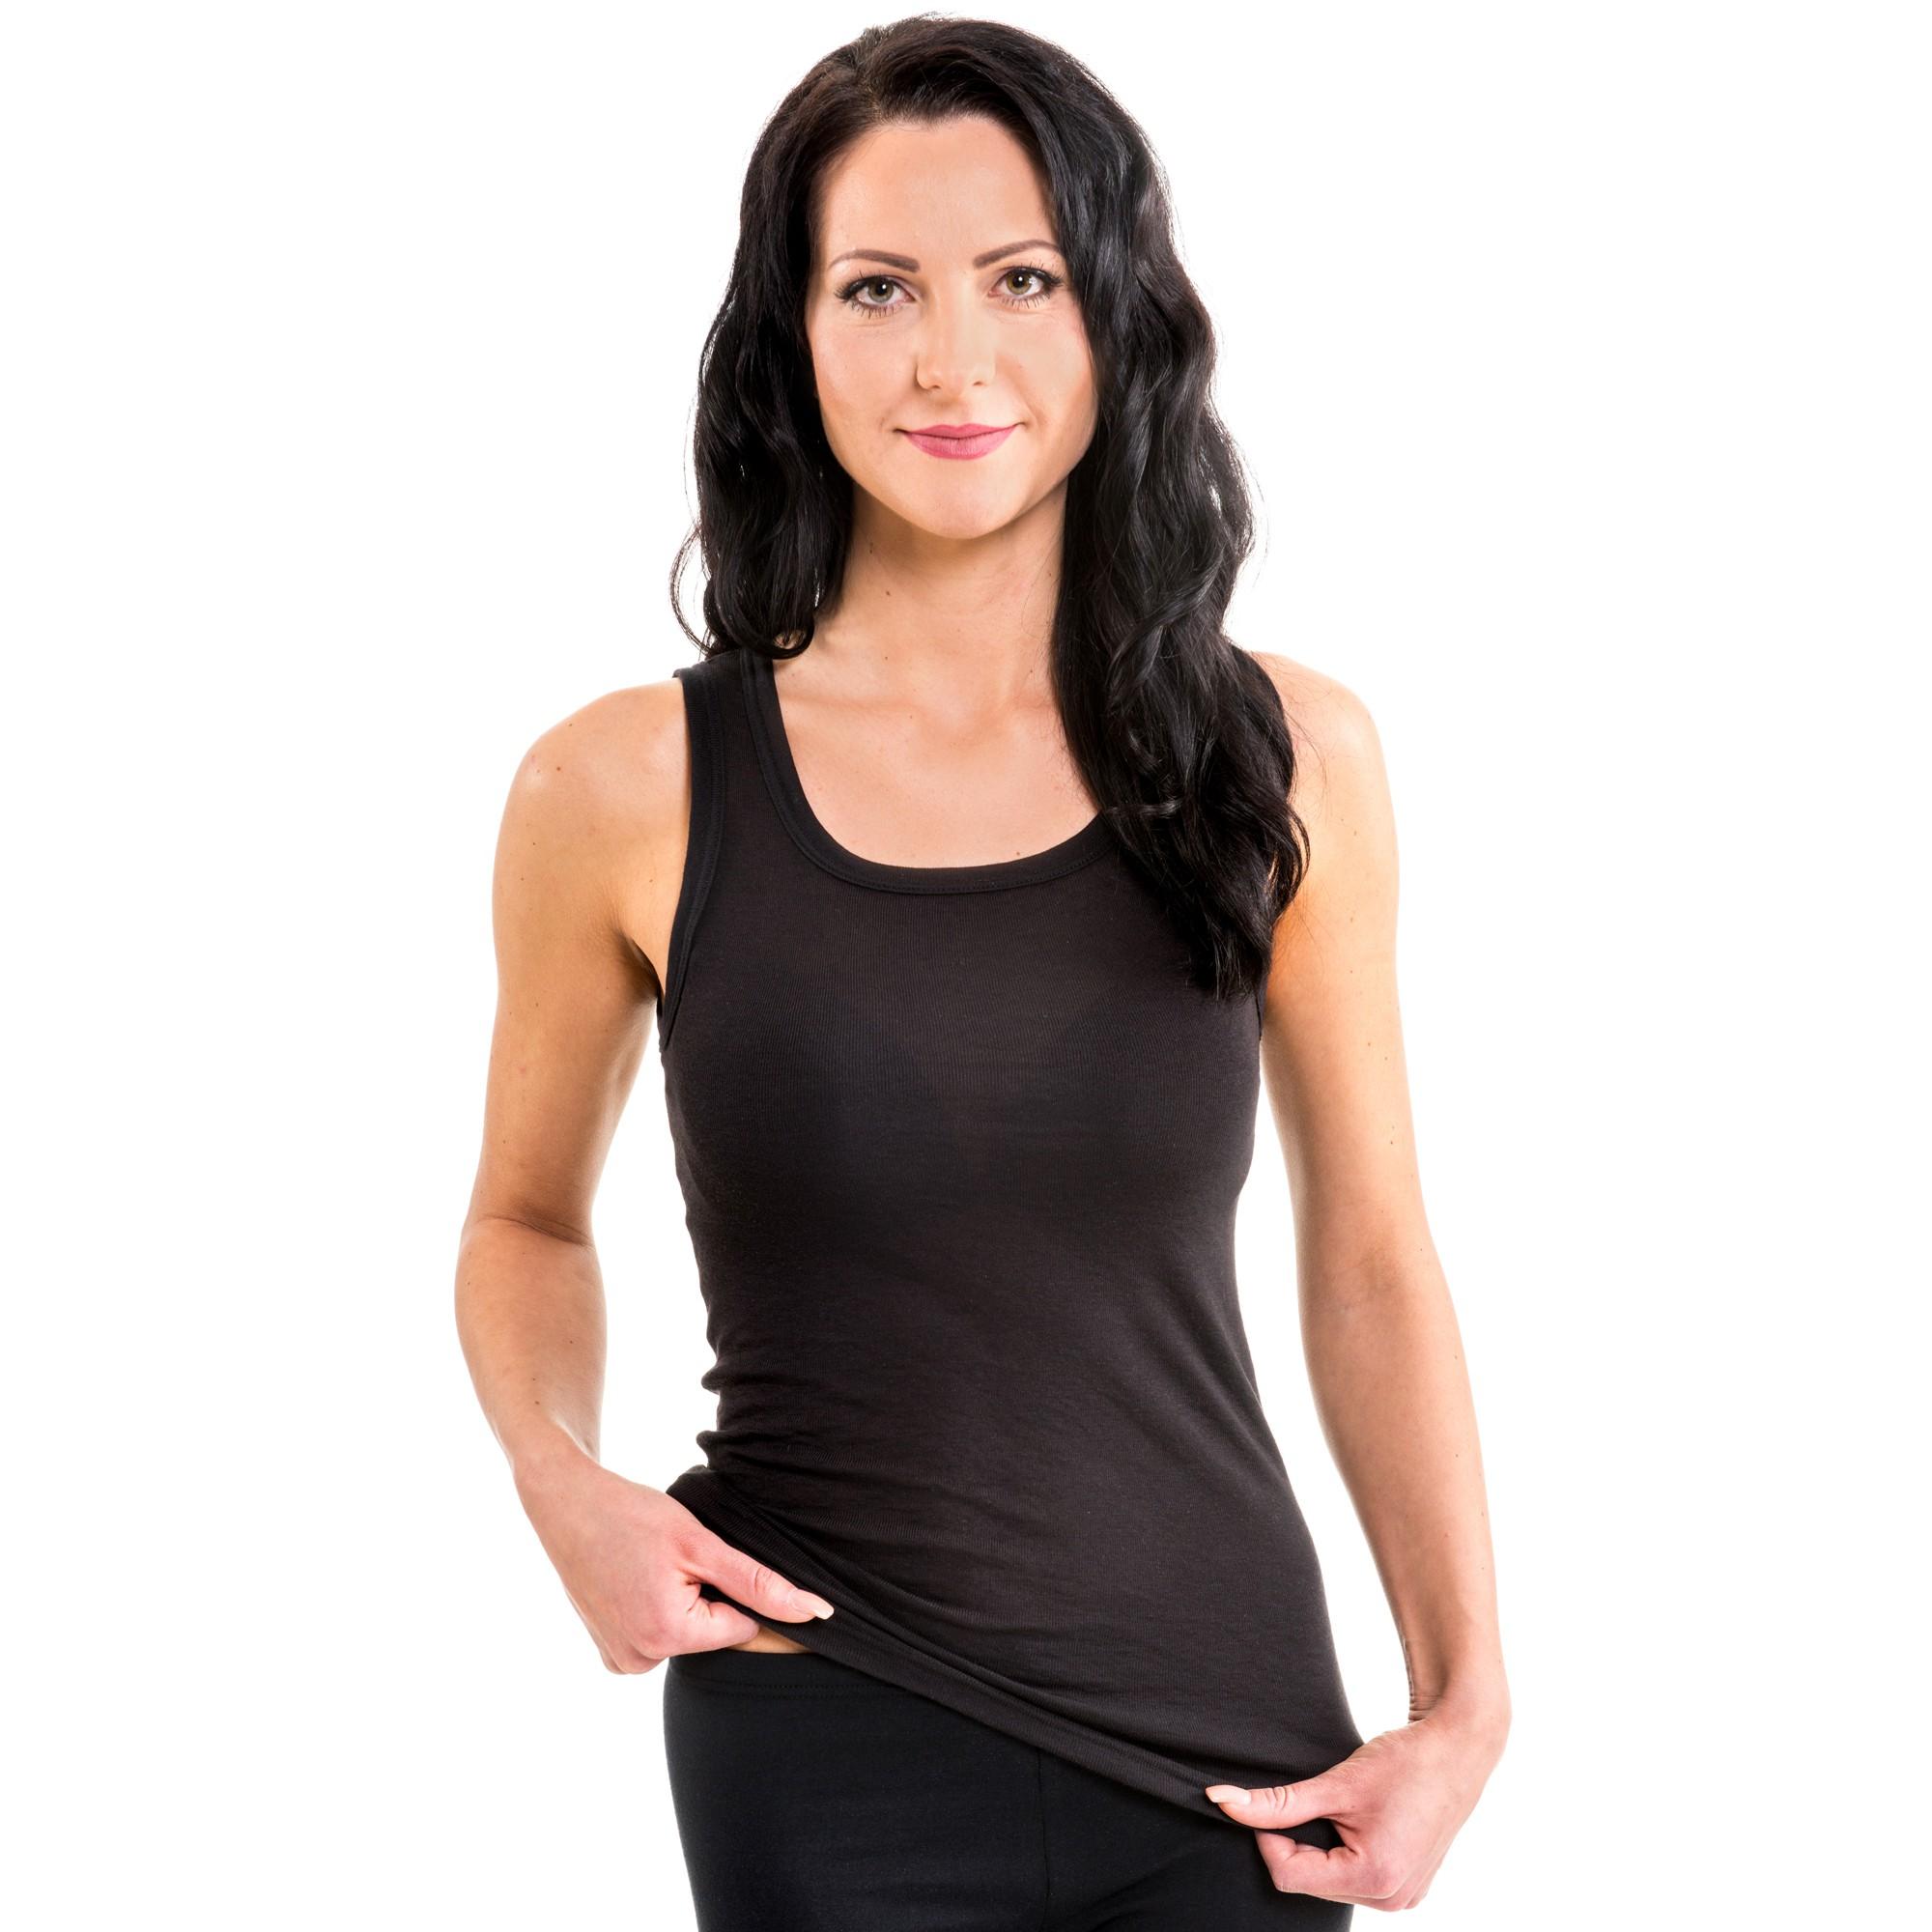 damen longshirt lady tank top shirt softfaser modal women. Black Bedroom Furniture Sets. Home Design Ideas